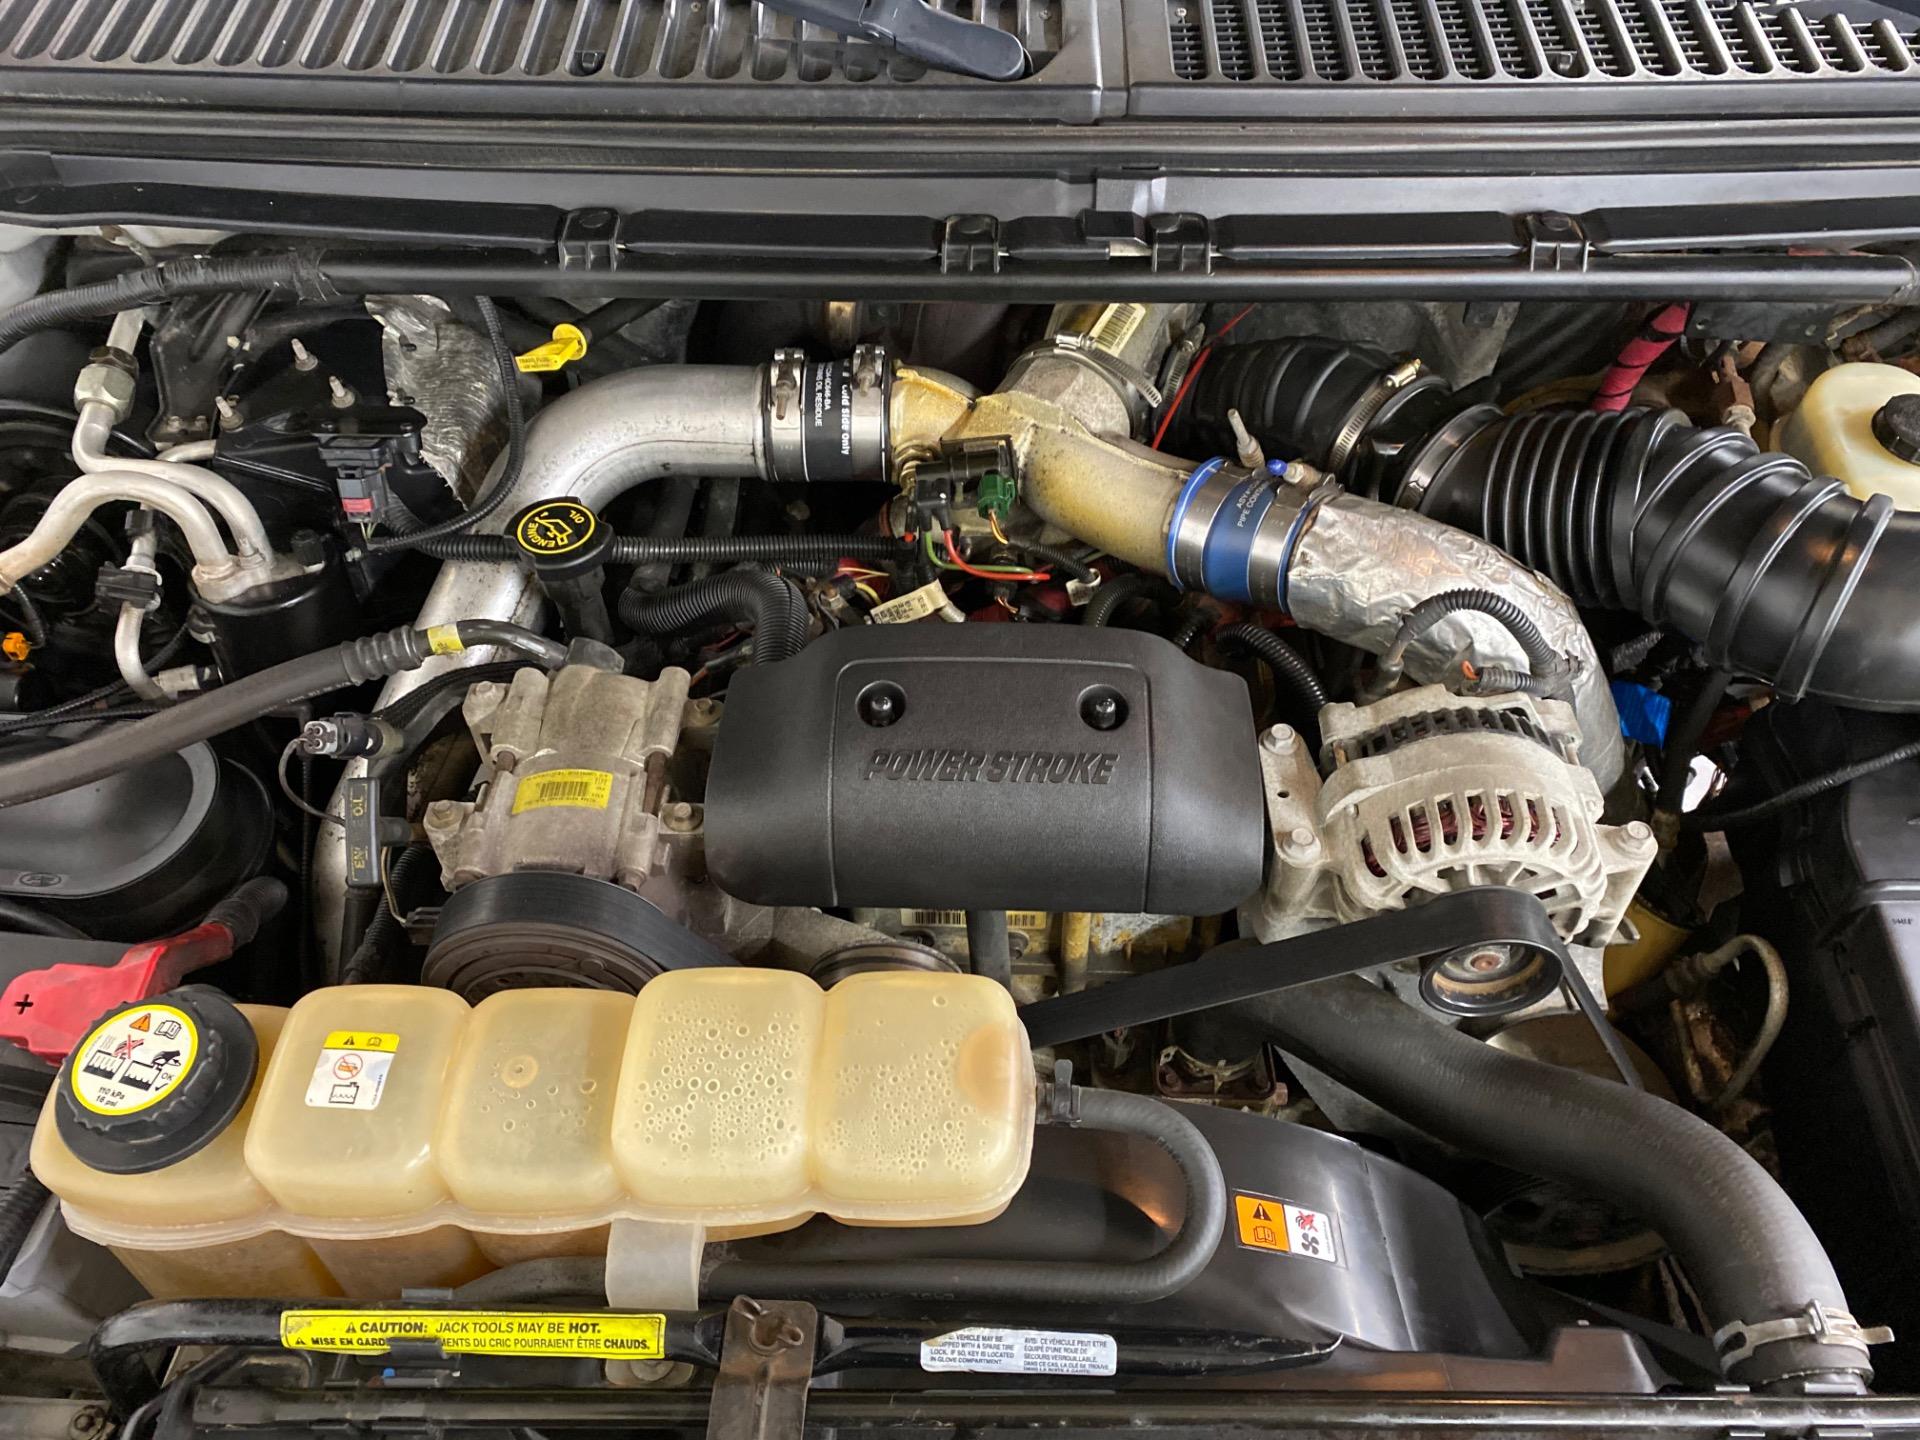 Used 2002 Ford F-250 Super Duty - LARIAT - 7.3L DEISEL - 4X4 CREW CAB - SUPER CLEAN -   Mundelein, IL